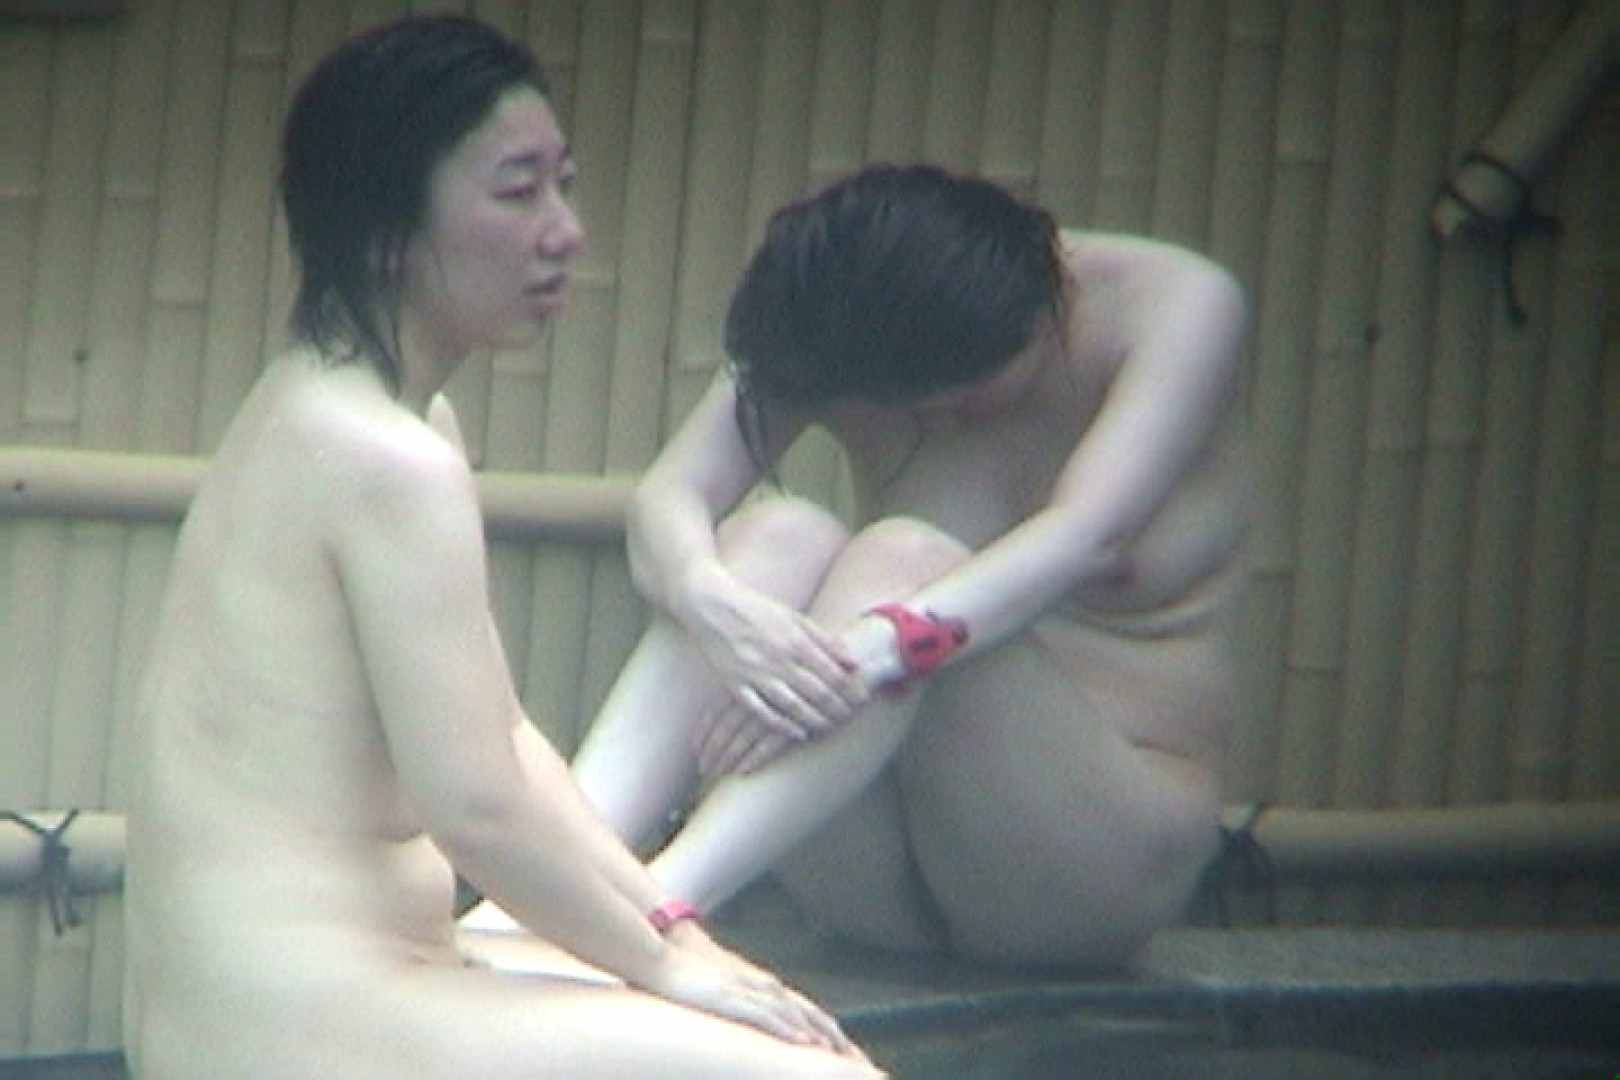 Aquaな露天風呂Vol.107 露天風呂 | OLのエロ生活  51連発 10